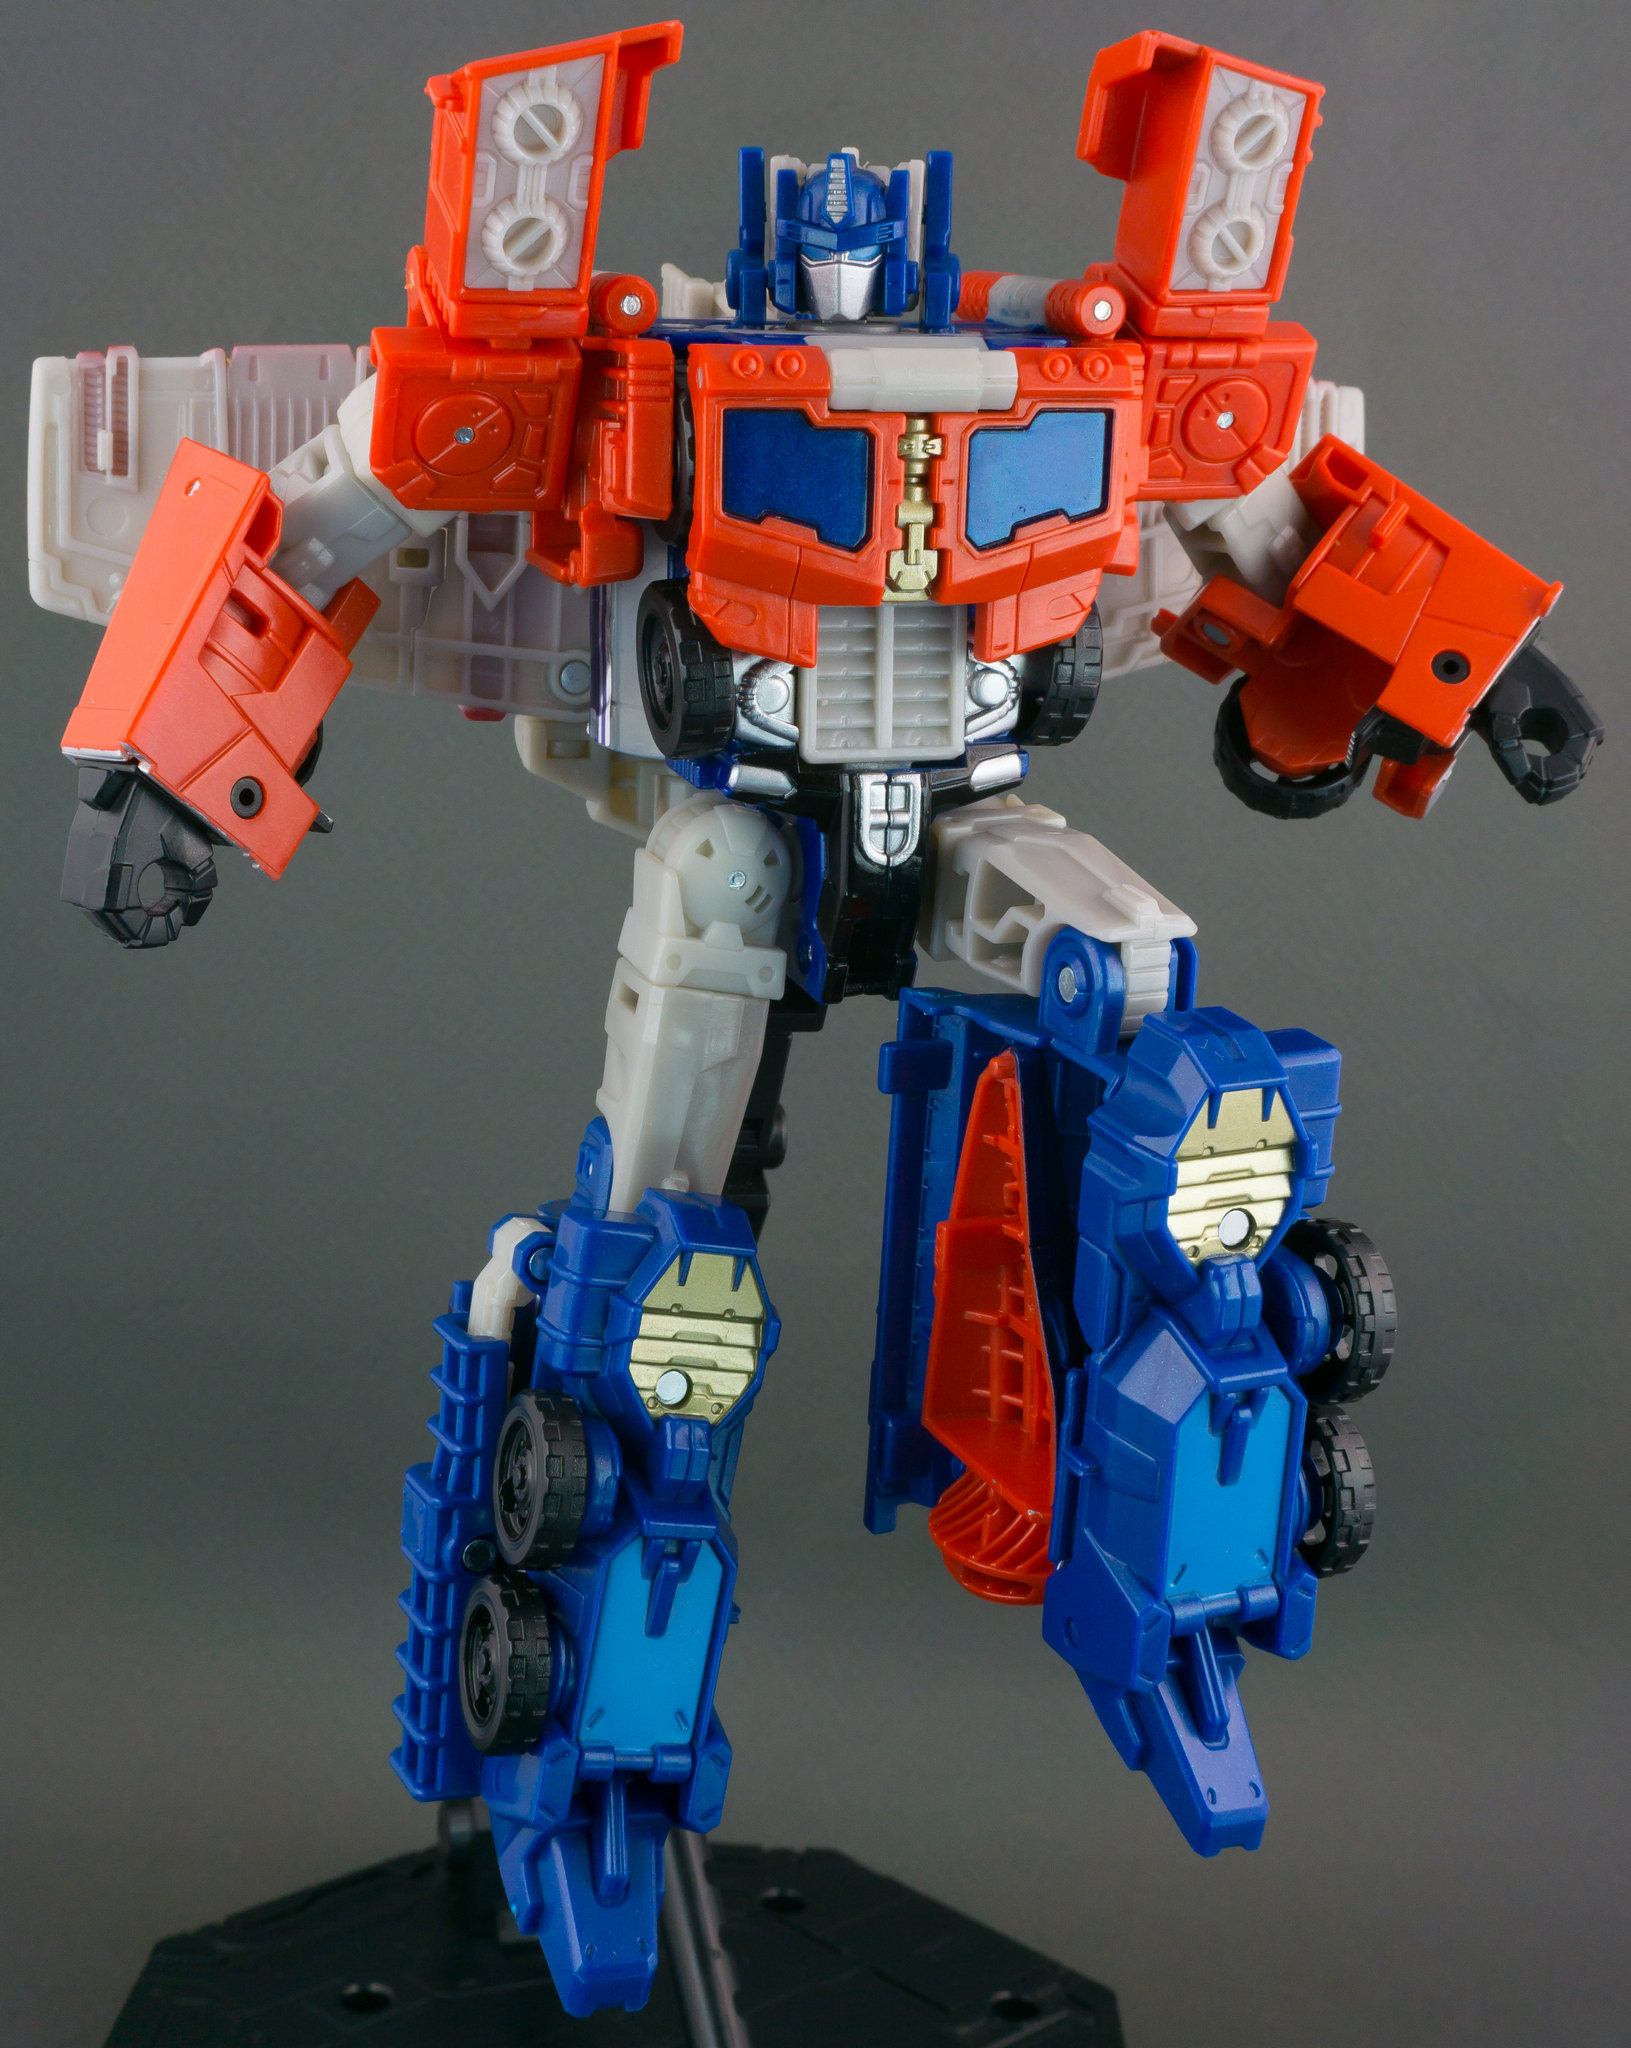 TFW2005's Titans Return Optimus Prime Photoshoot ...